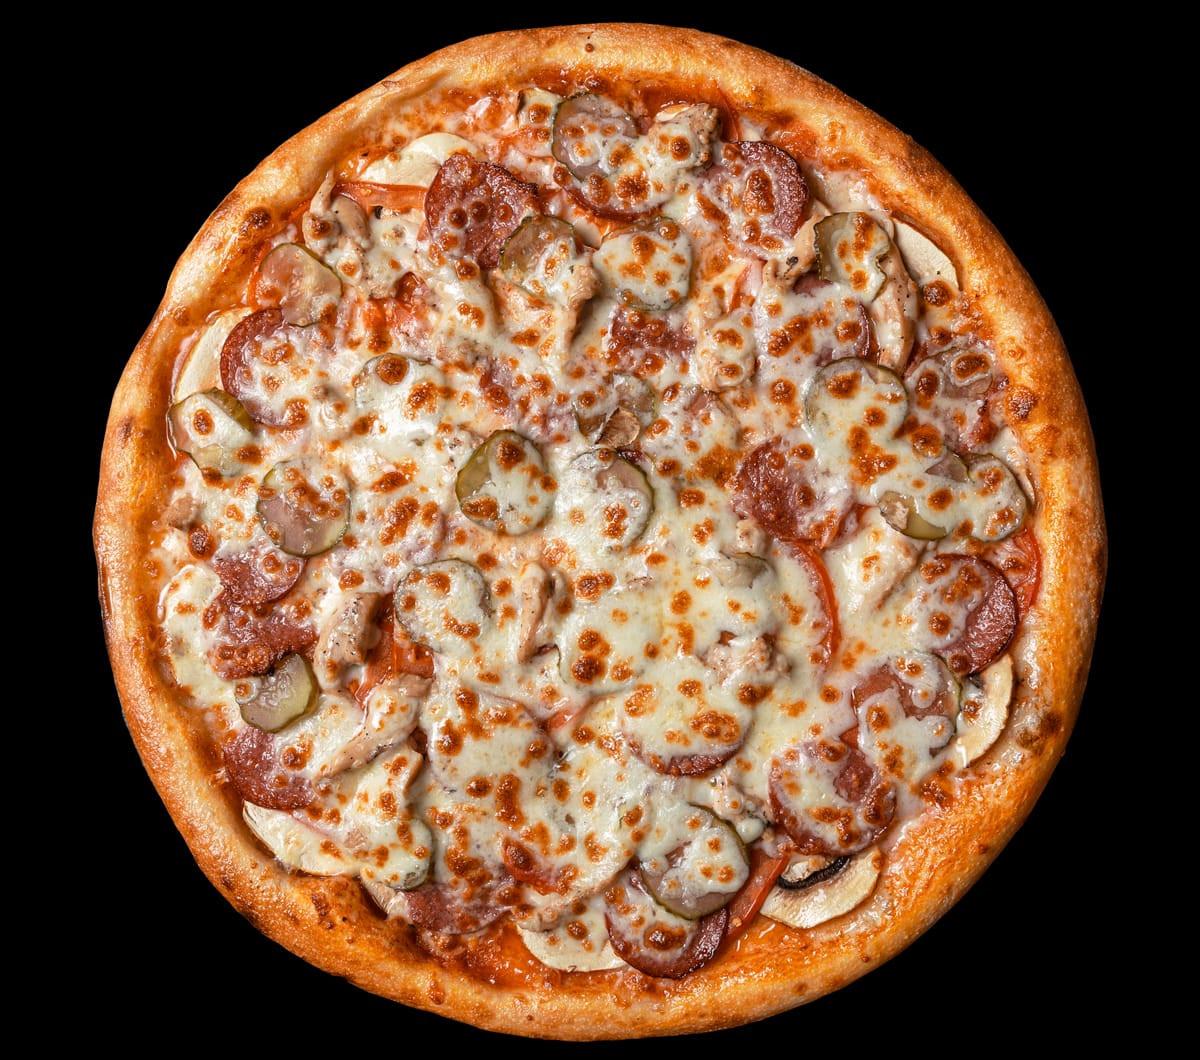 заказать: Пицца - Кантри